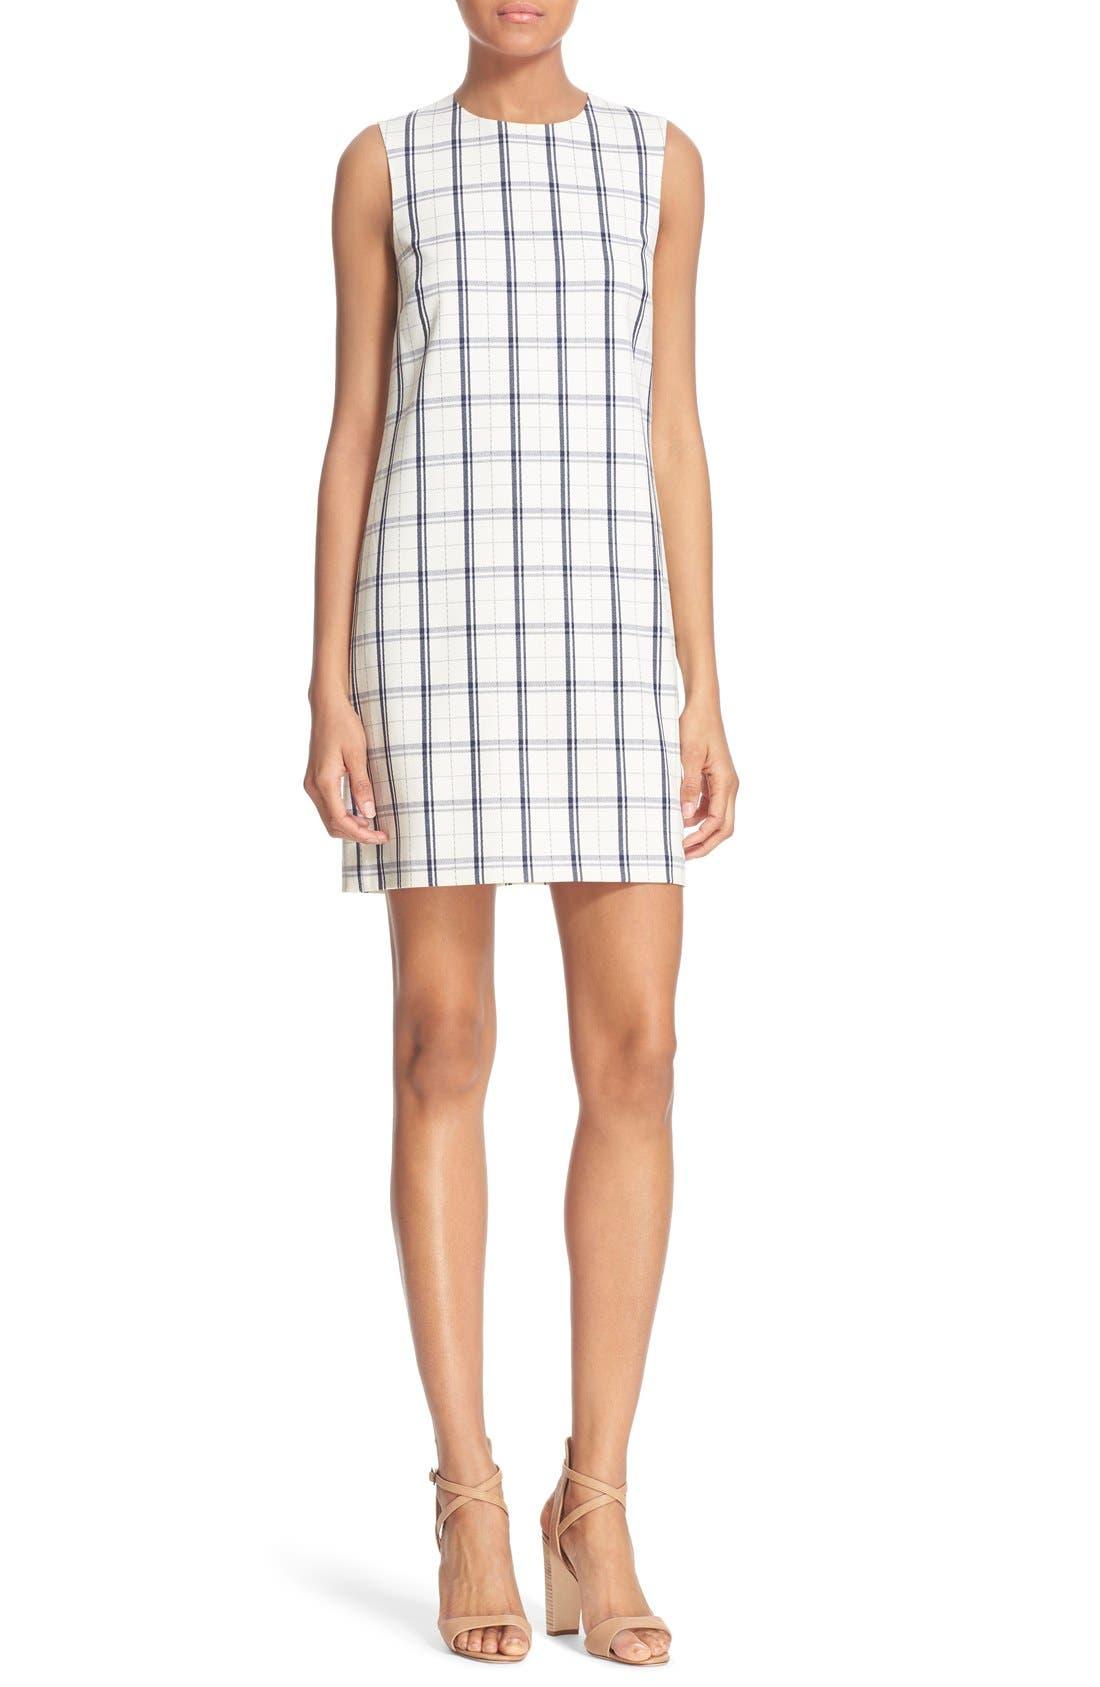 THEORY 'Adraya' Check Stretch Wool Shift Dress, Main, color, 900